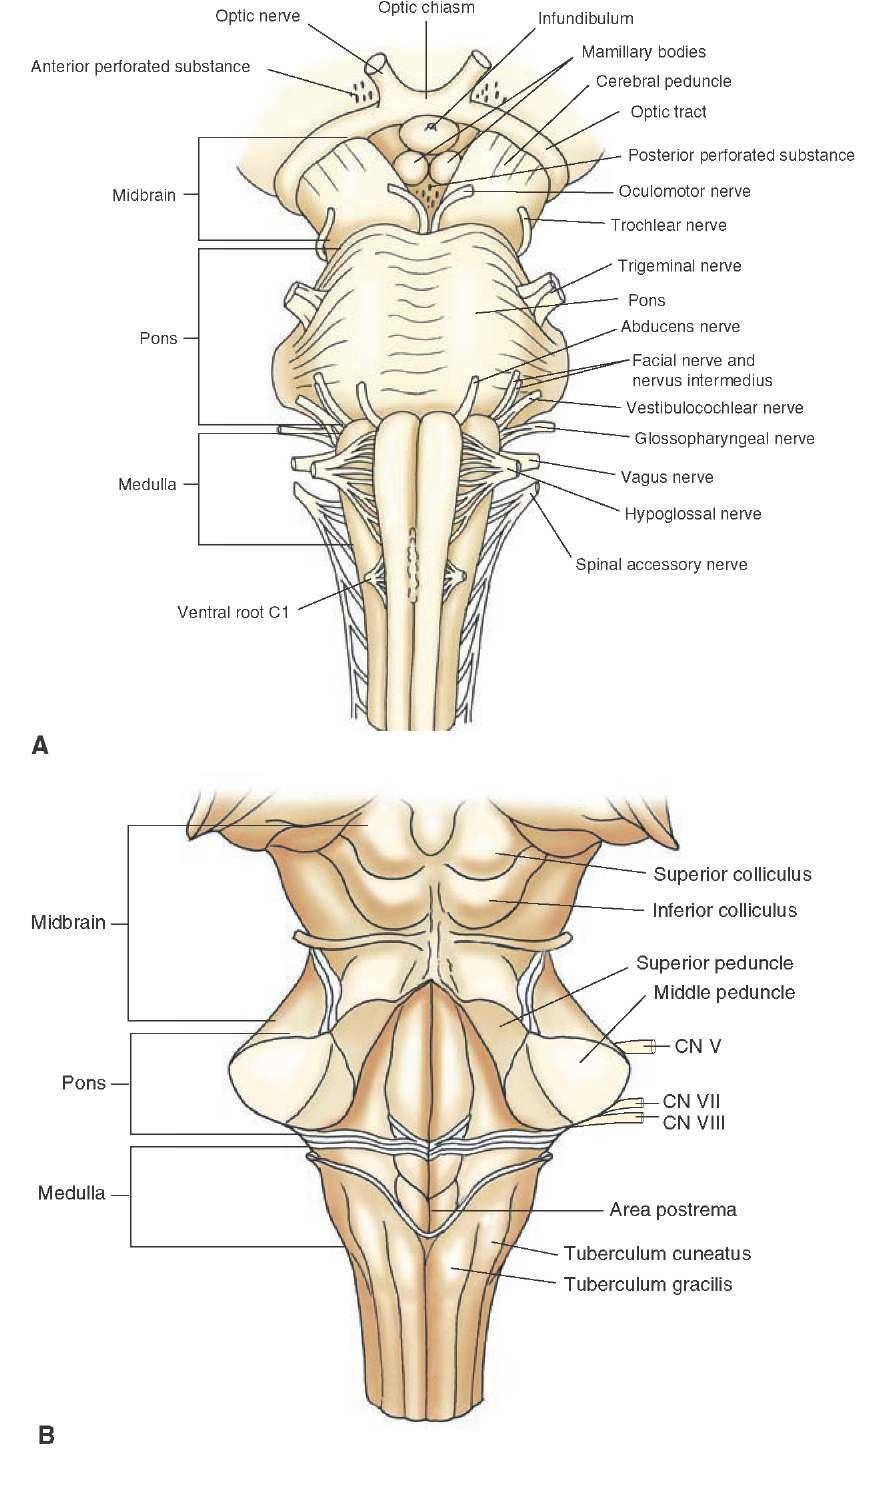 medium resolution of brainstem i the medulla organization of the central nervous system part 1